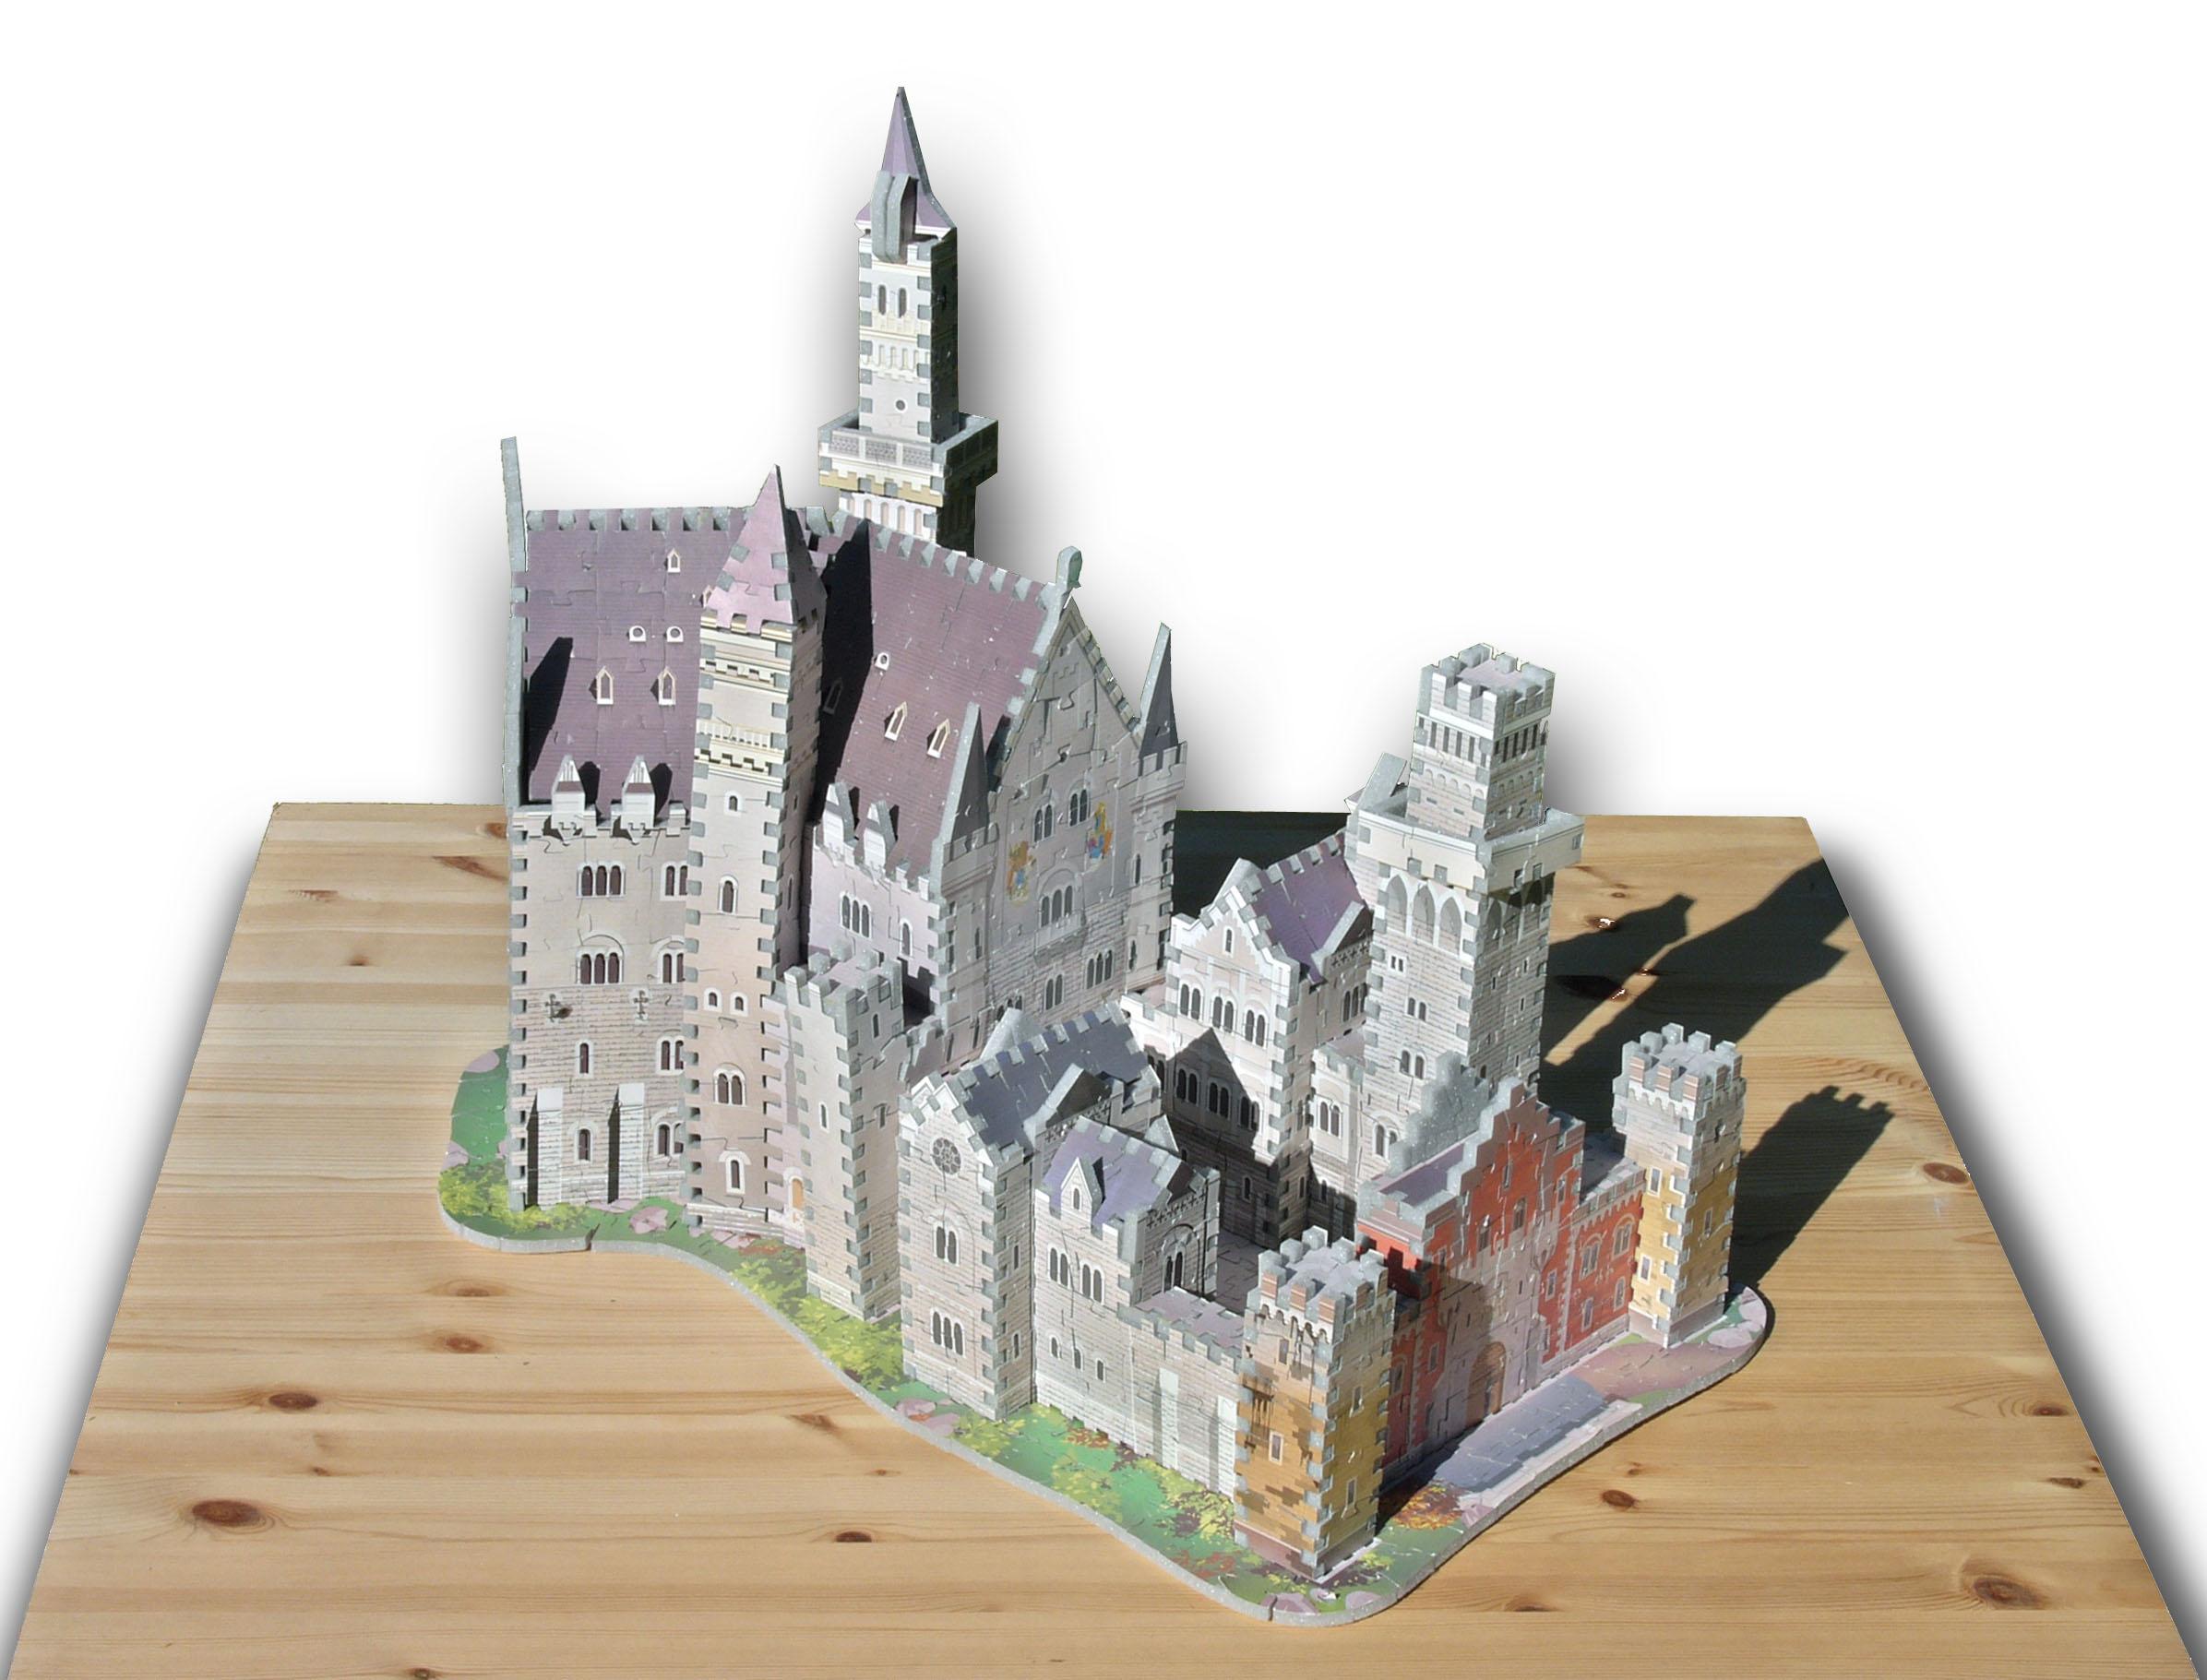 3D Puzzle Mit Beleuchtung | 3d Puzzle Wikipedia